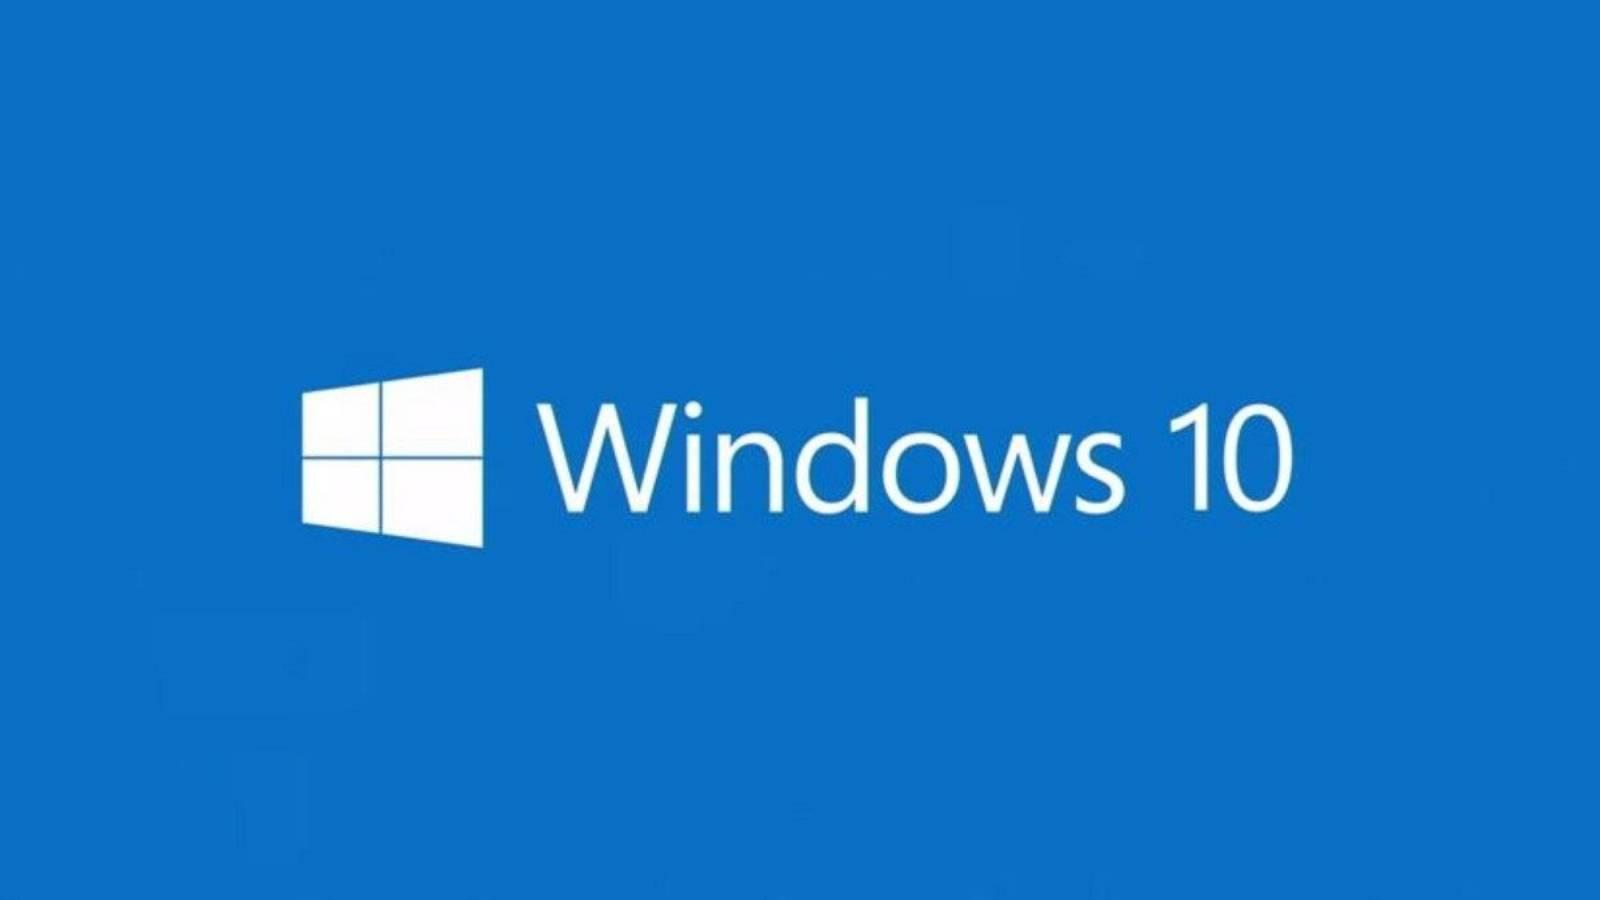 Windows 10 incredere